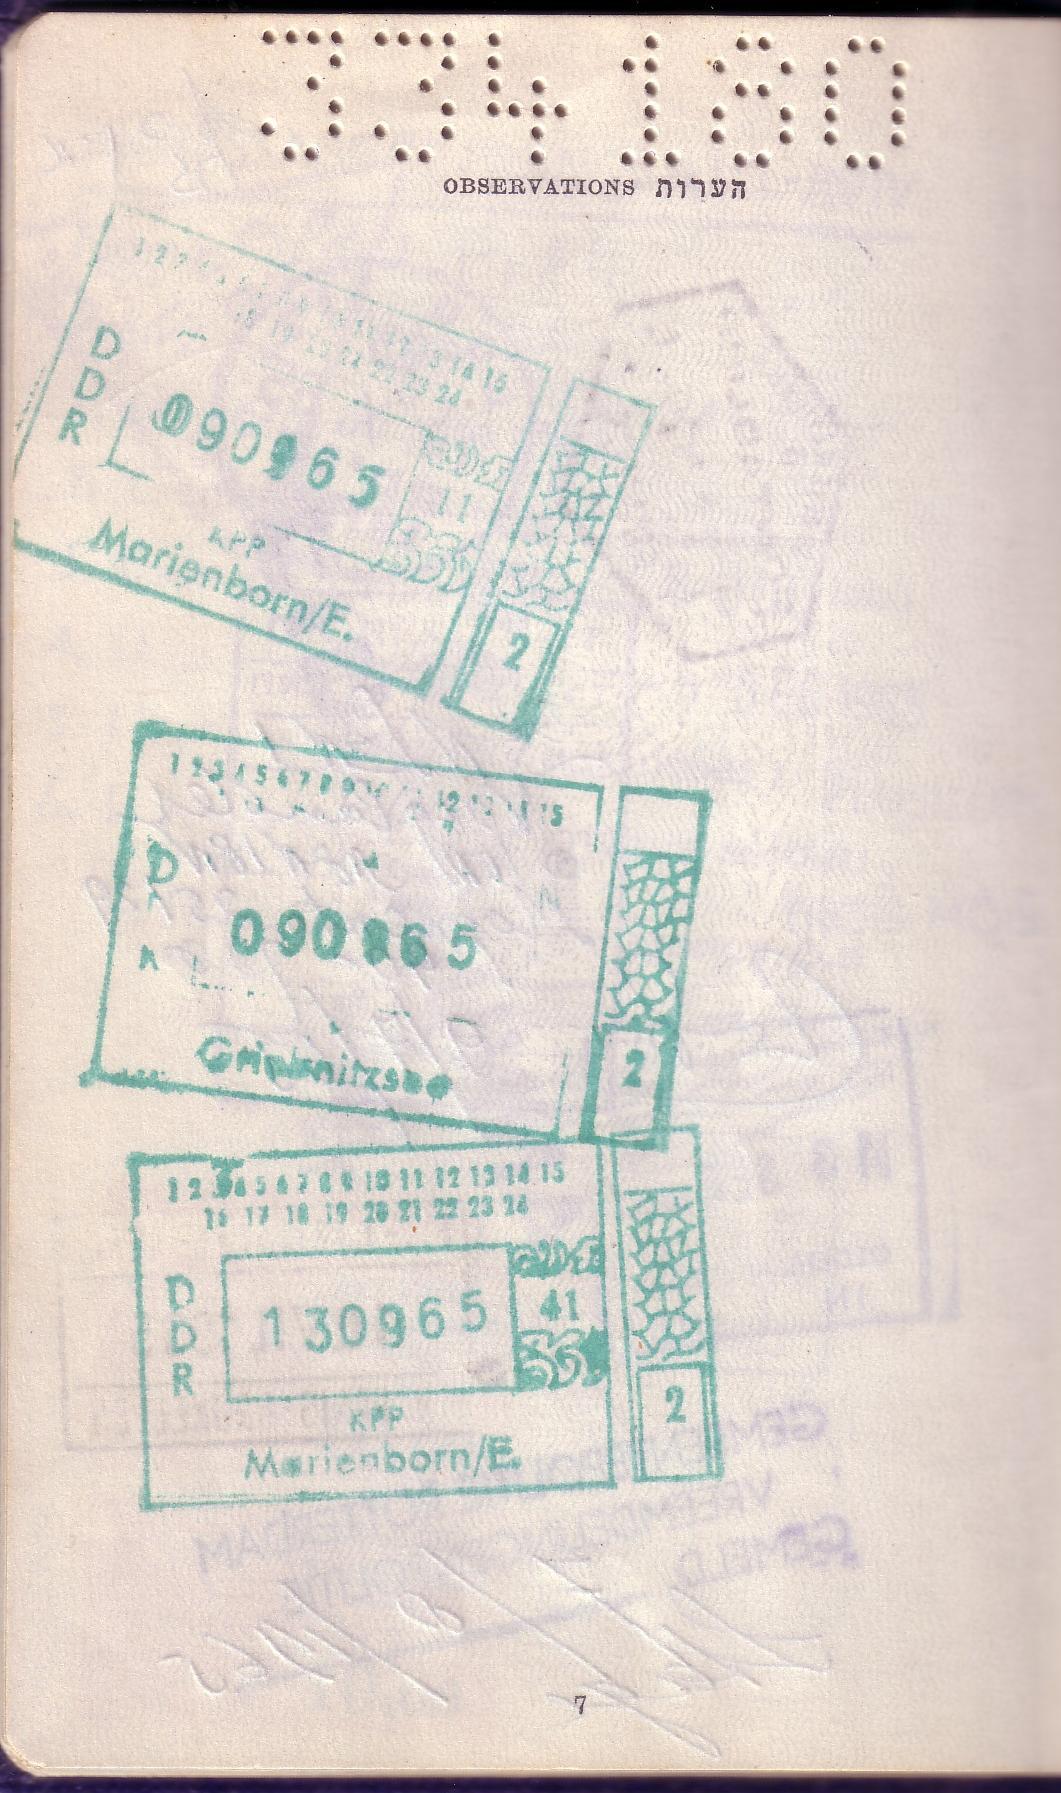 FileEast West Berlin Border Crossing Stamps In An Israeli Passport